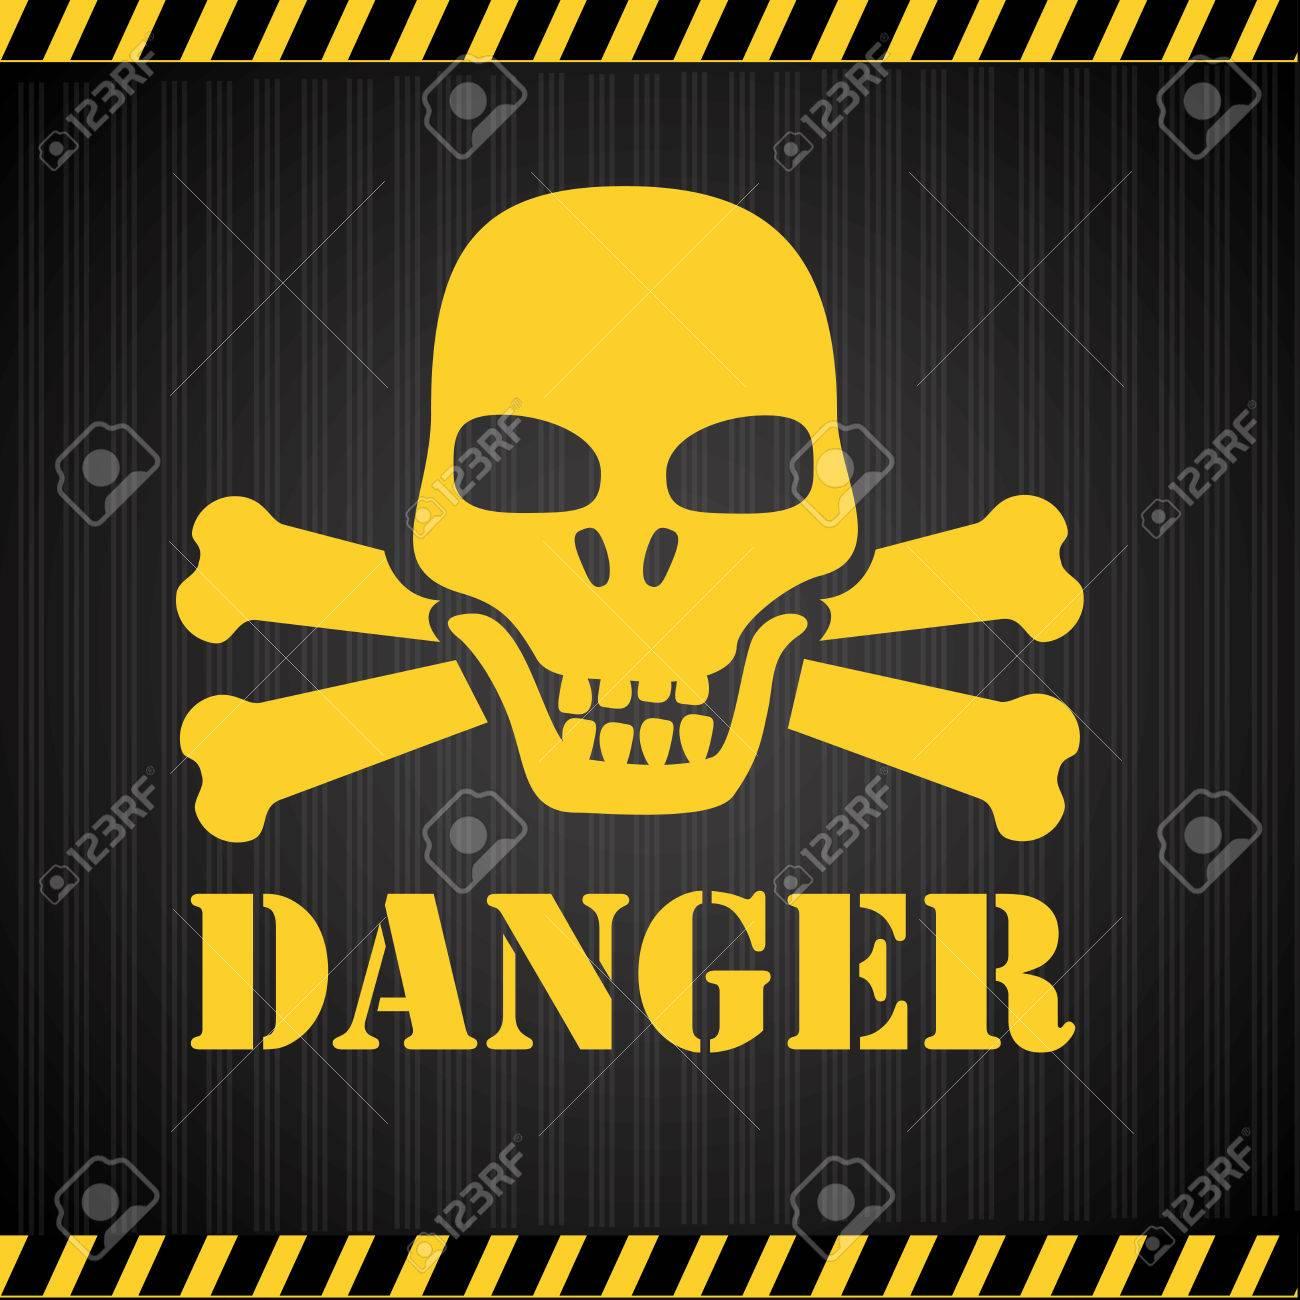 Danger design over black background, vector illustration Stock Vector - 28548705